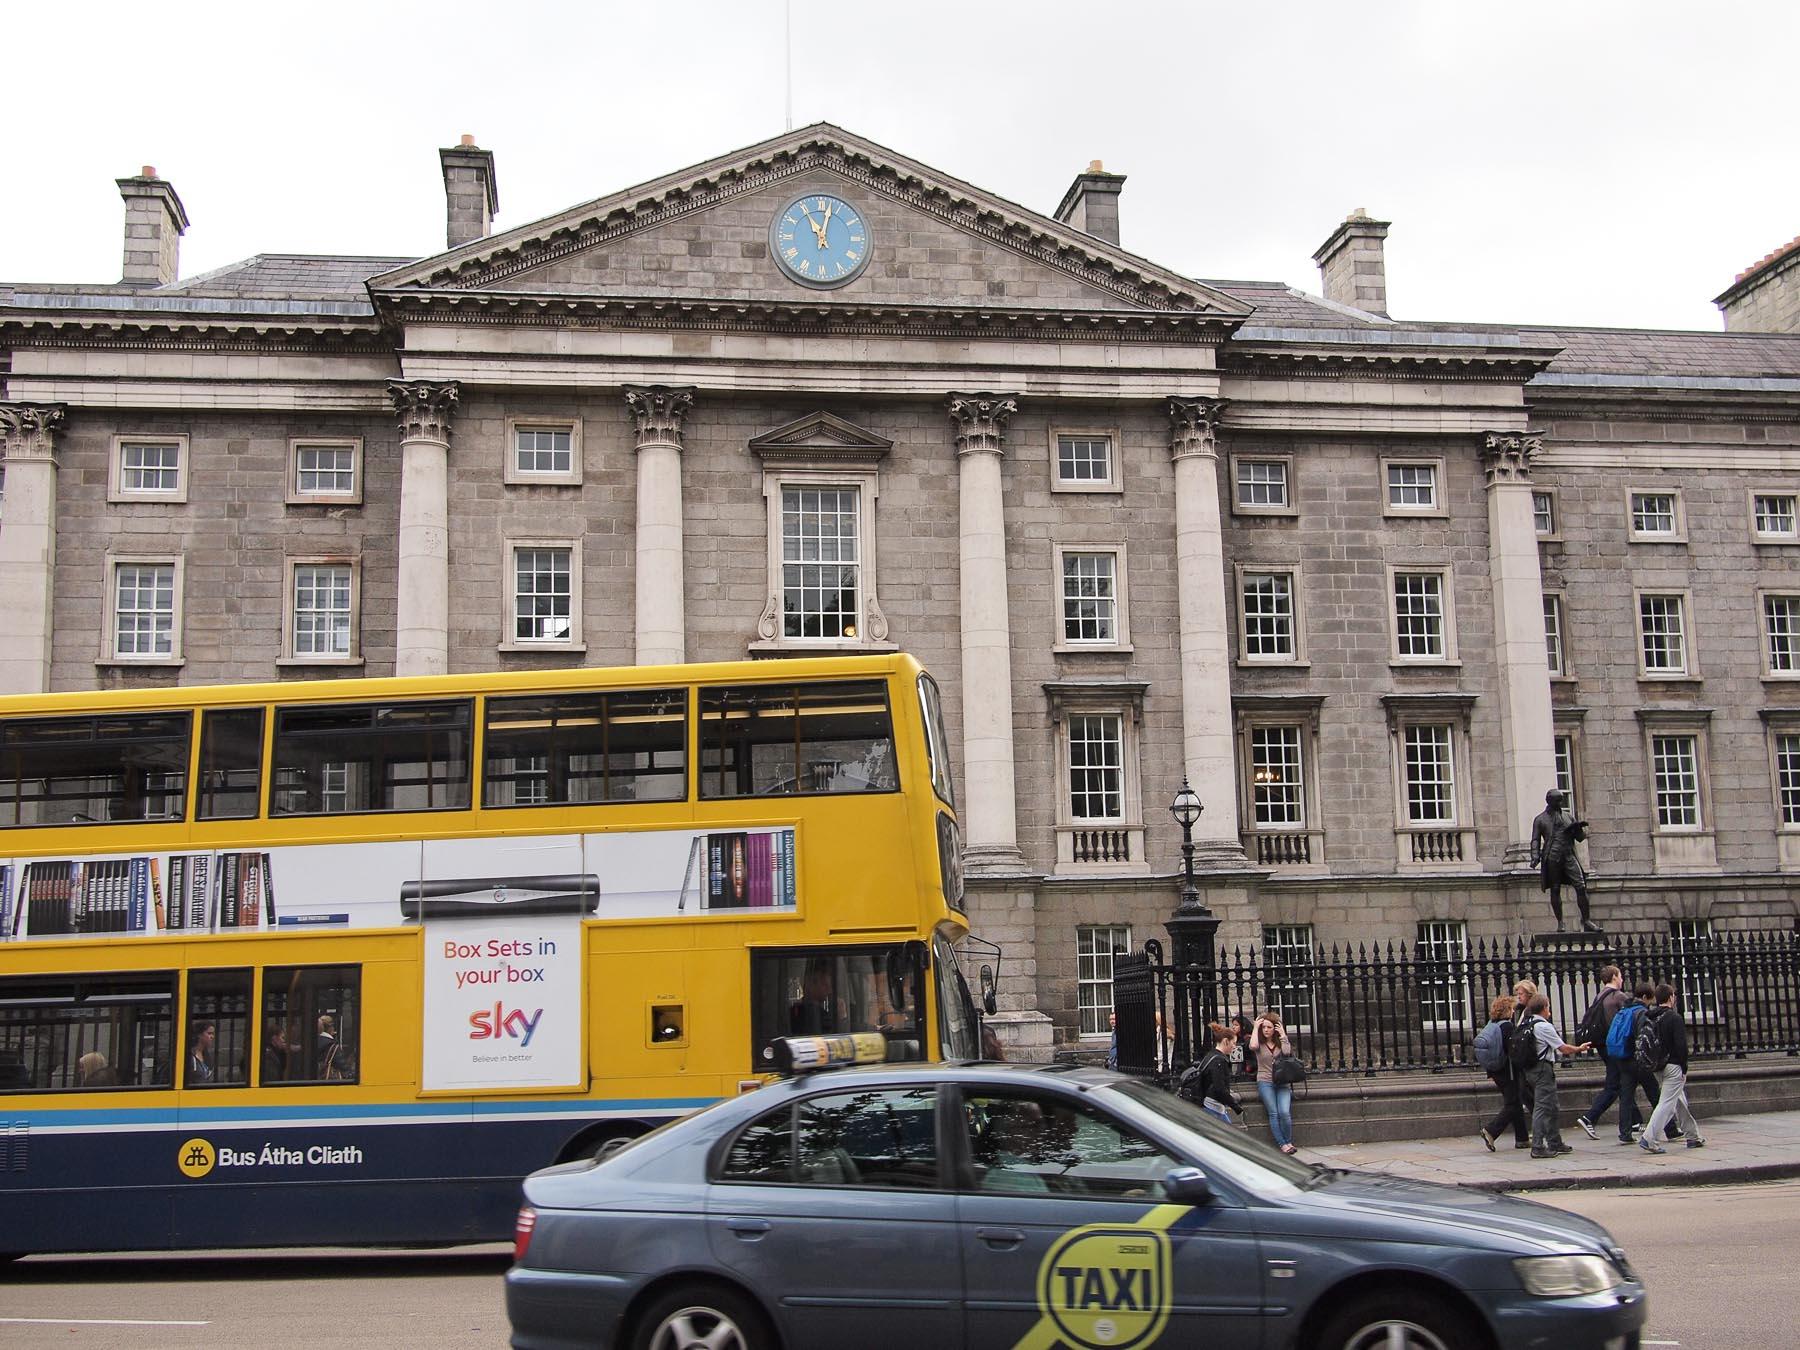 Dublinin Julkinen Liikenne